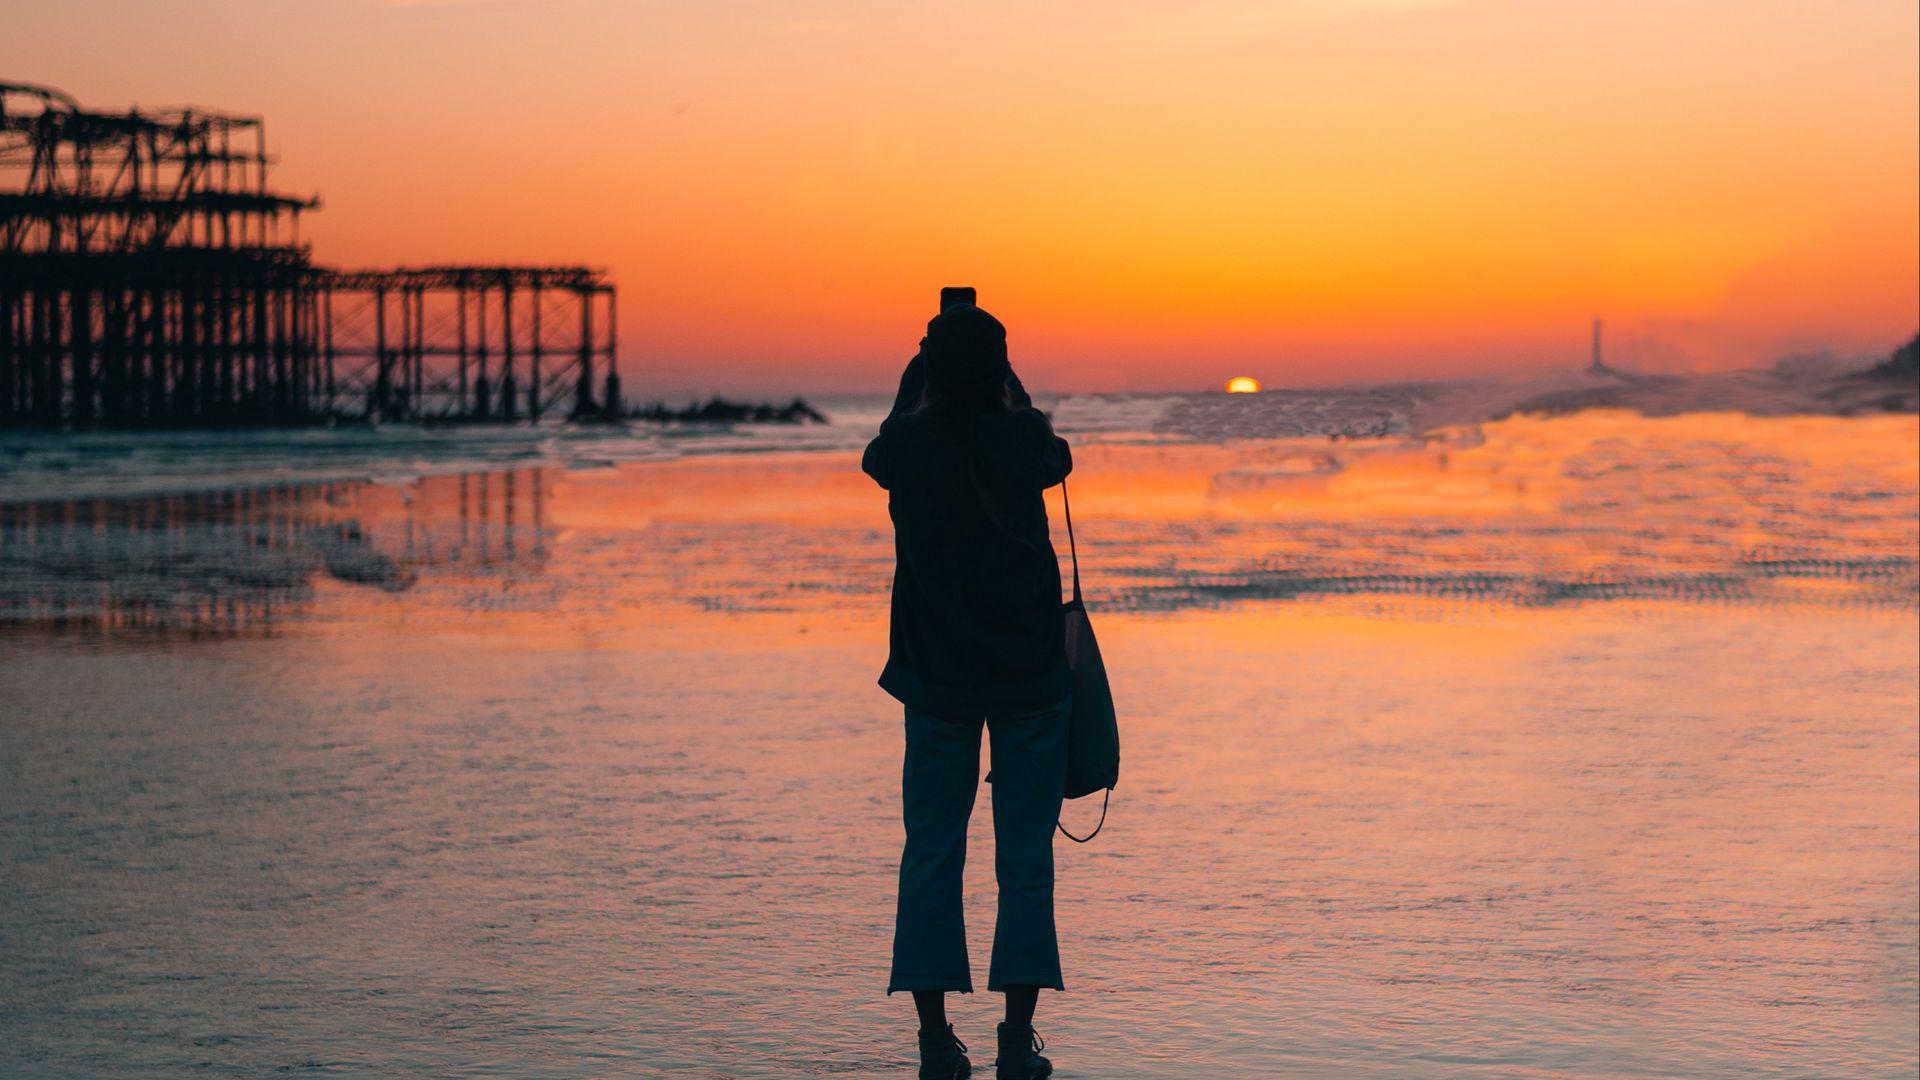 1920x1080 Wallpaper silhouette, alone, beach, sea, sunset, dark